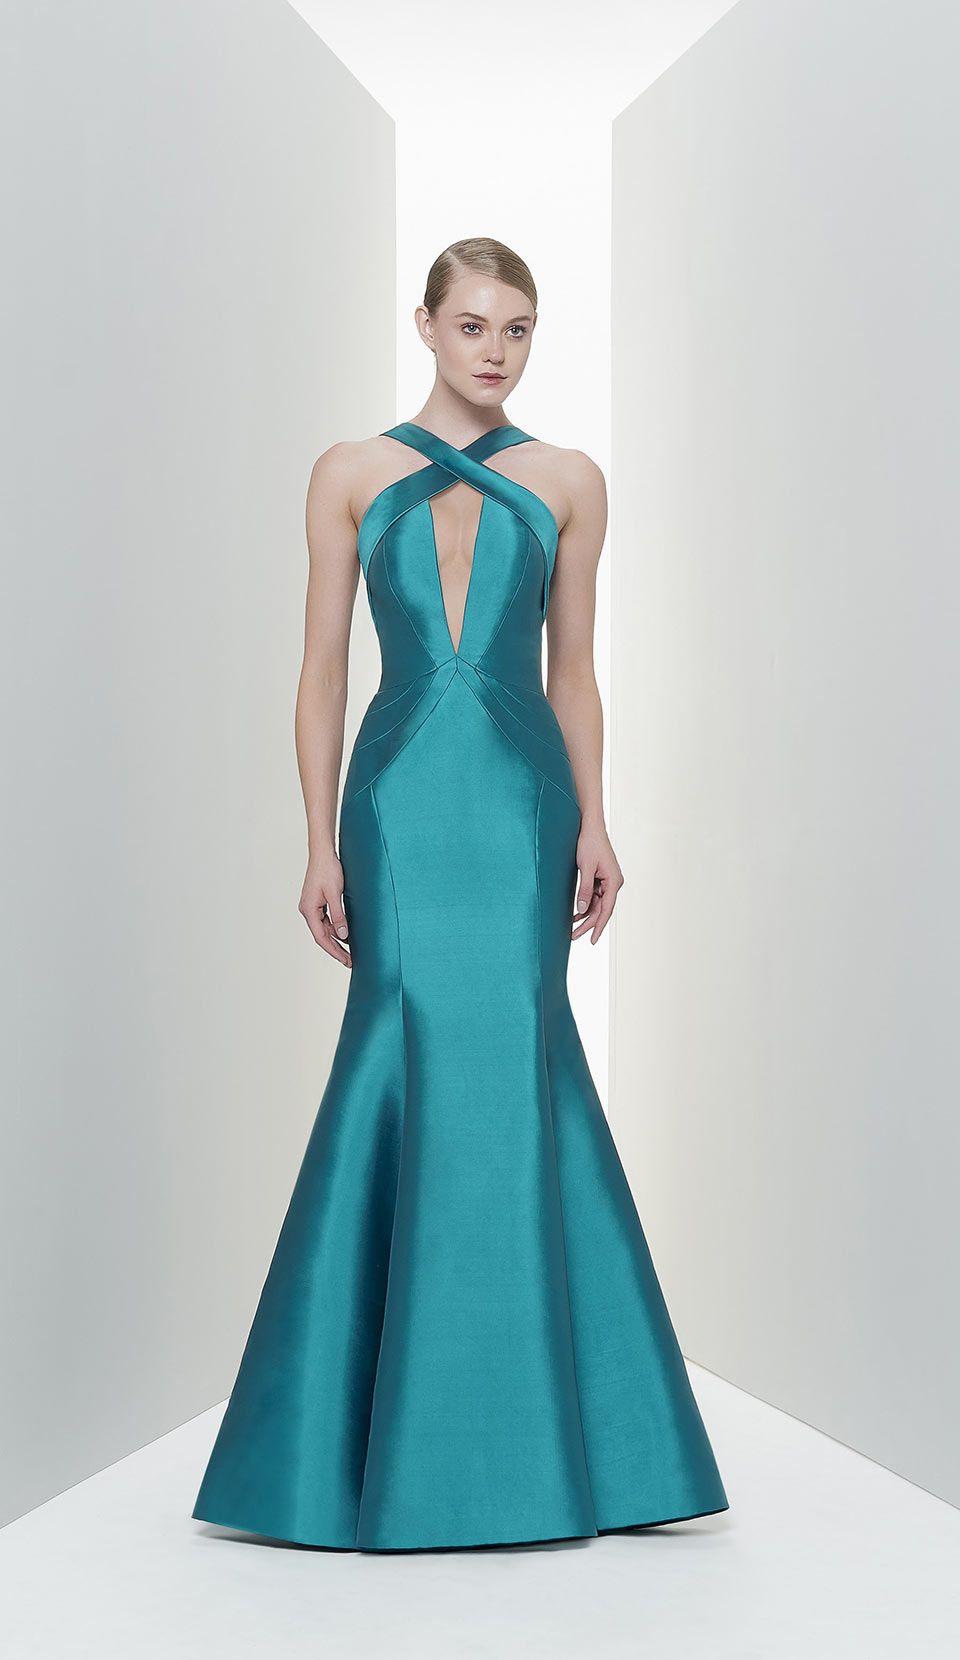 Vestido azul renda encomenda global